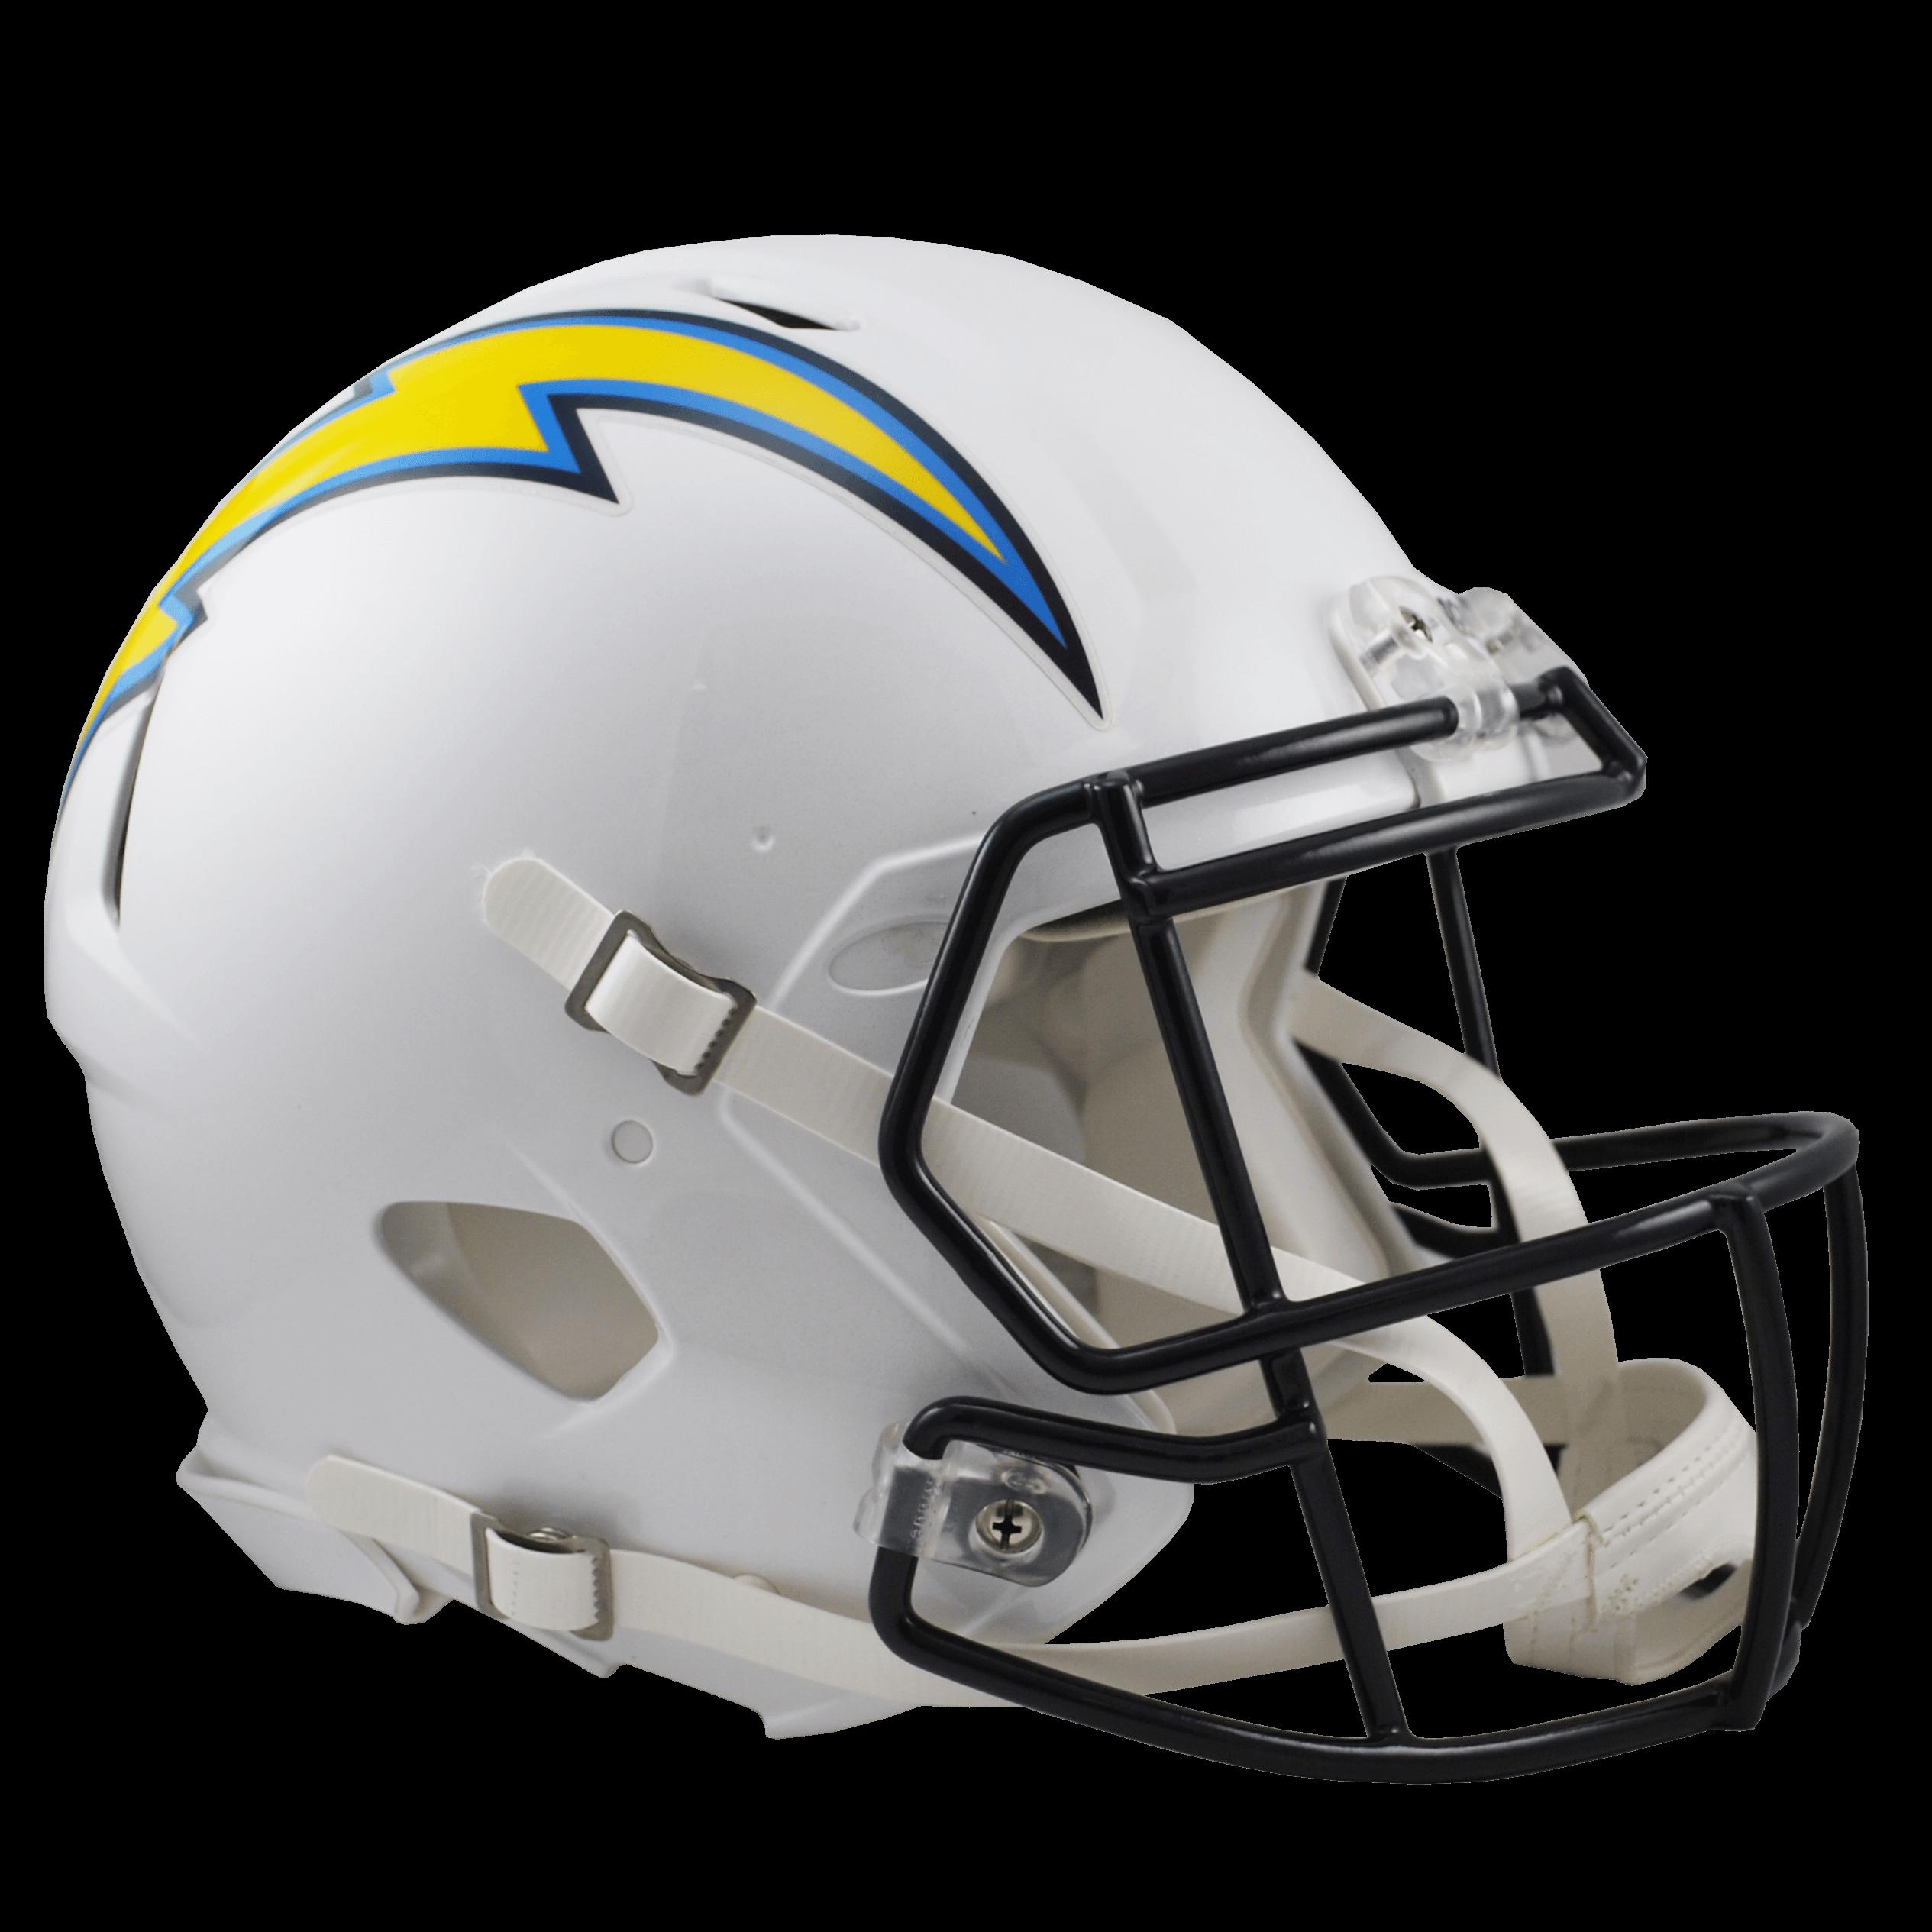 San Diego Chargers Helmet: San Diego Chargers Helmet Transparent PNG